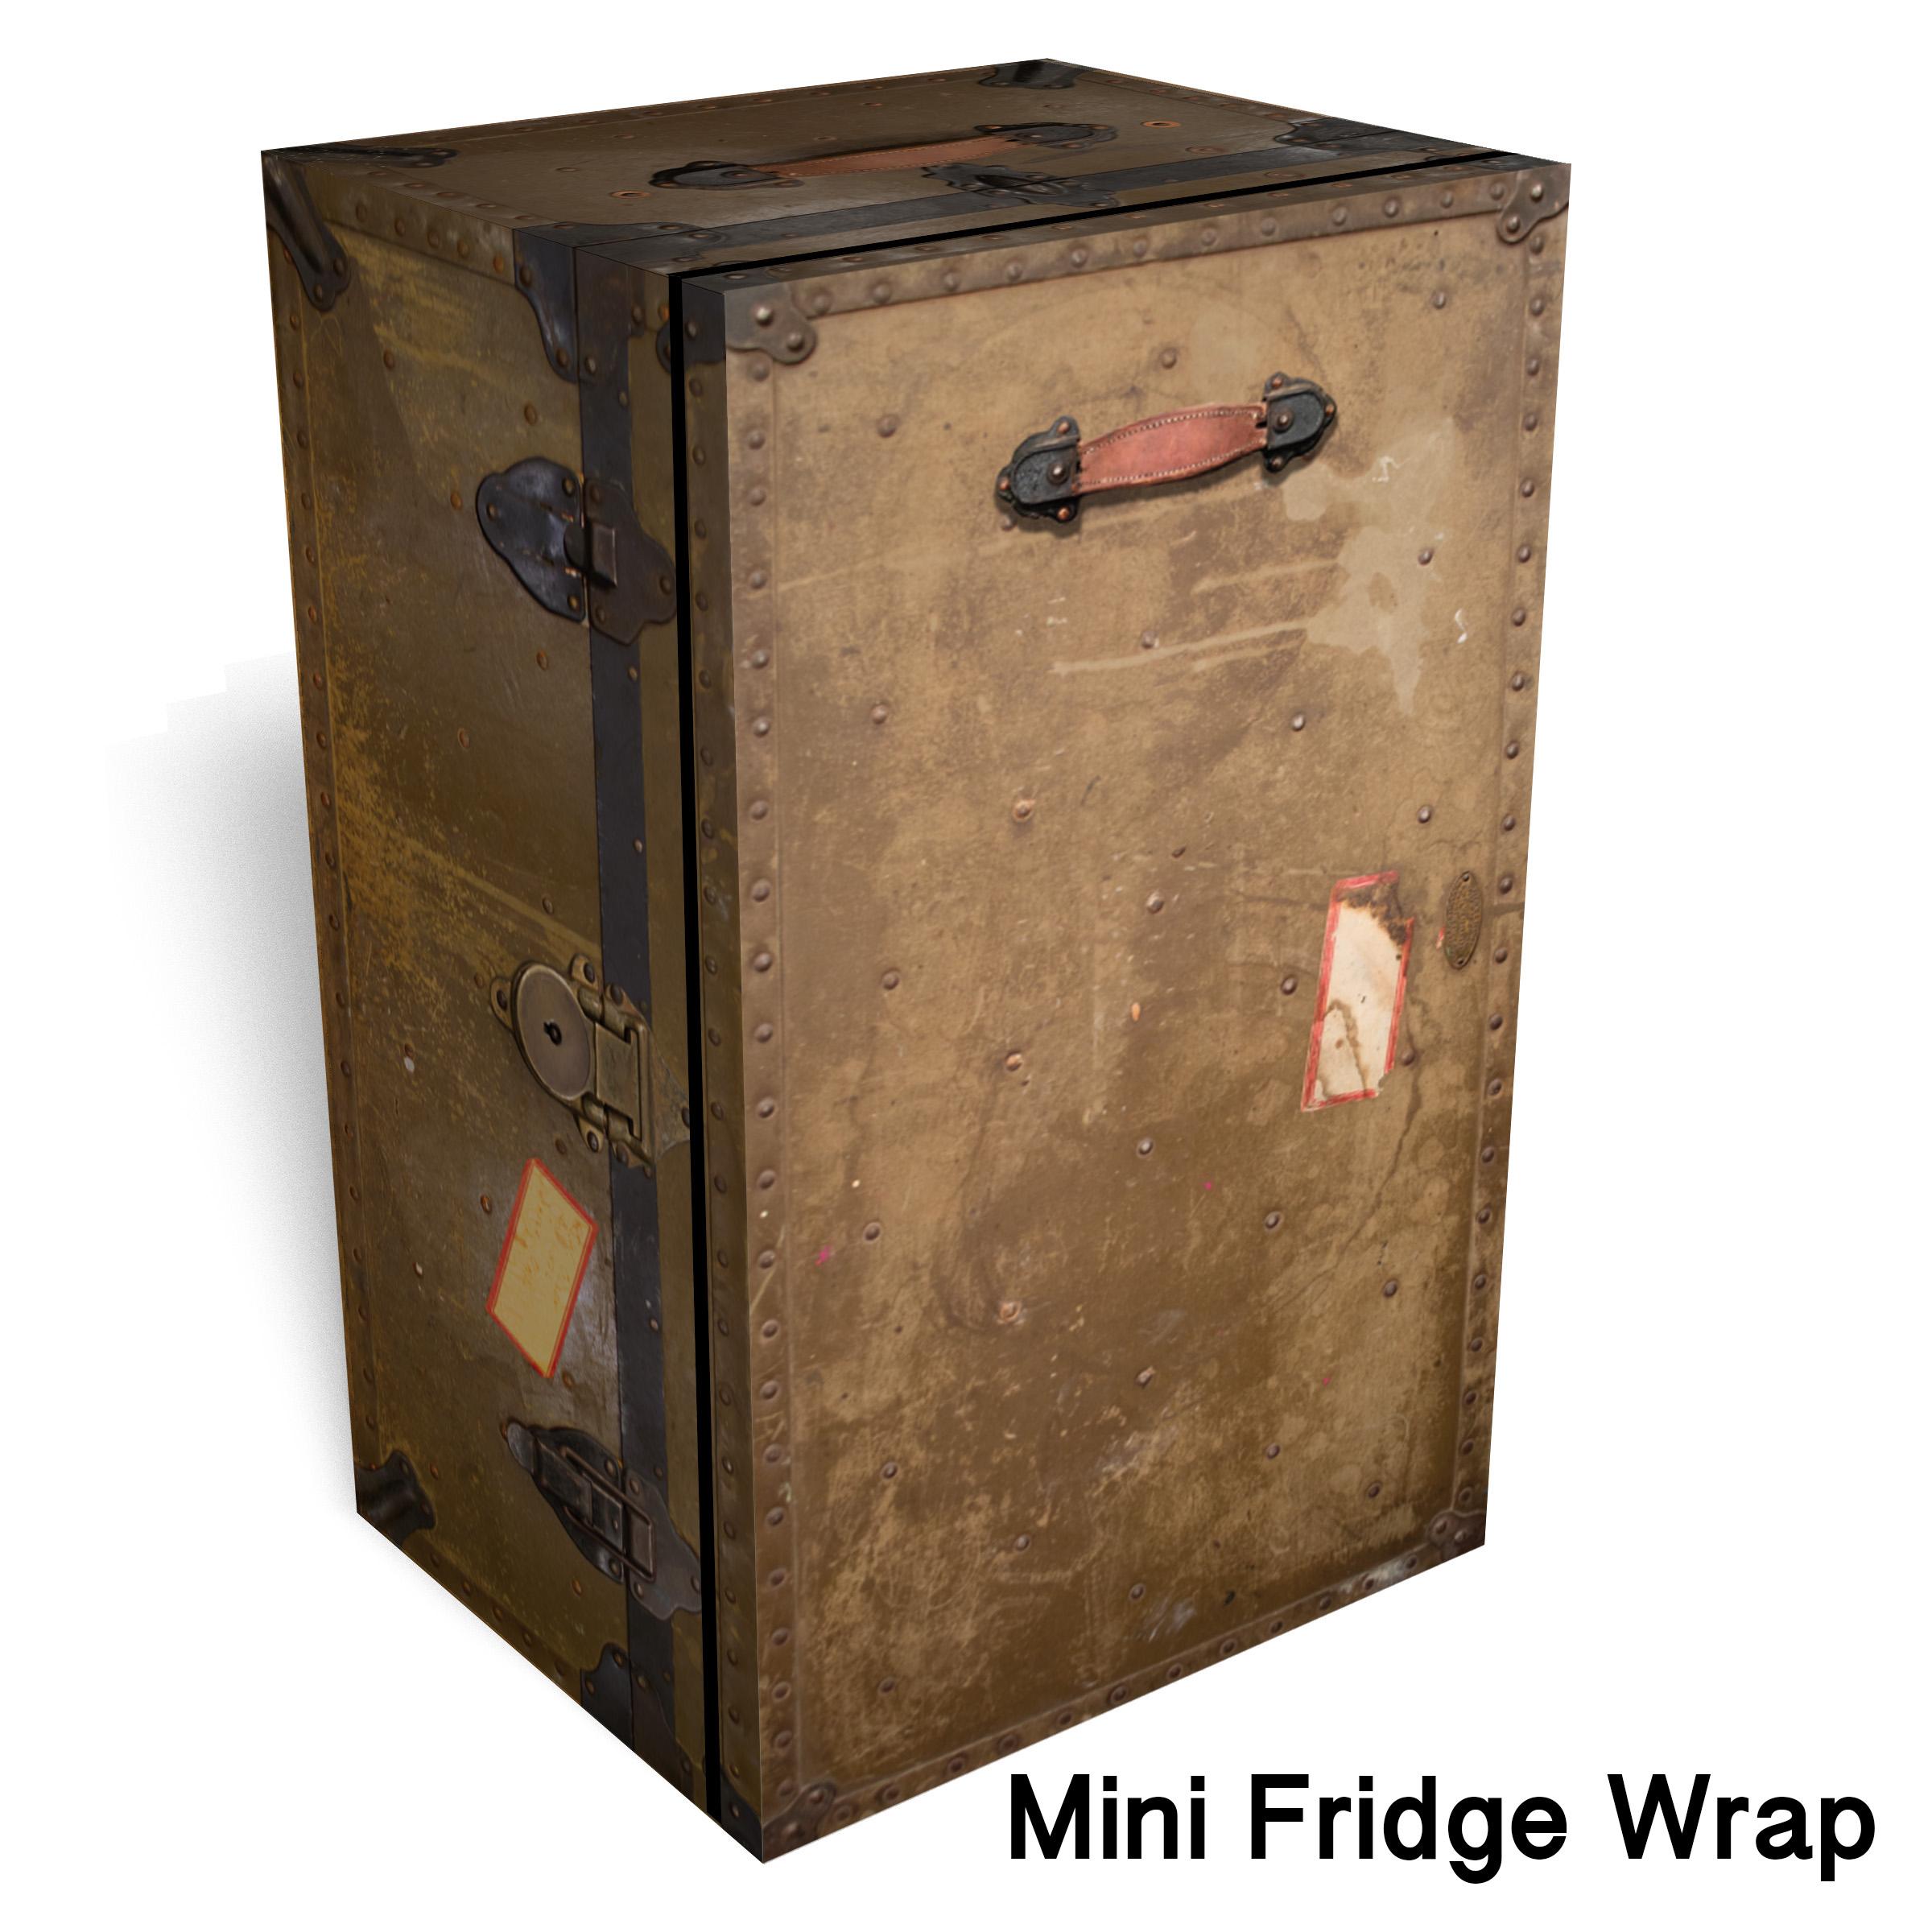 Vintage Army Trunk Mini Fridge Wrap